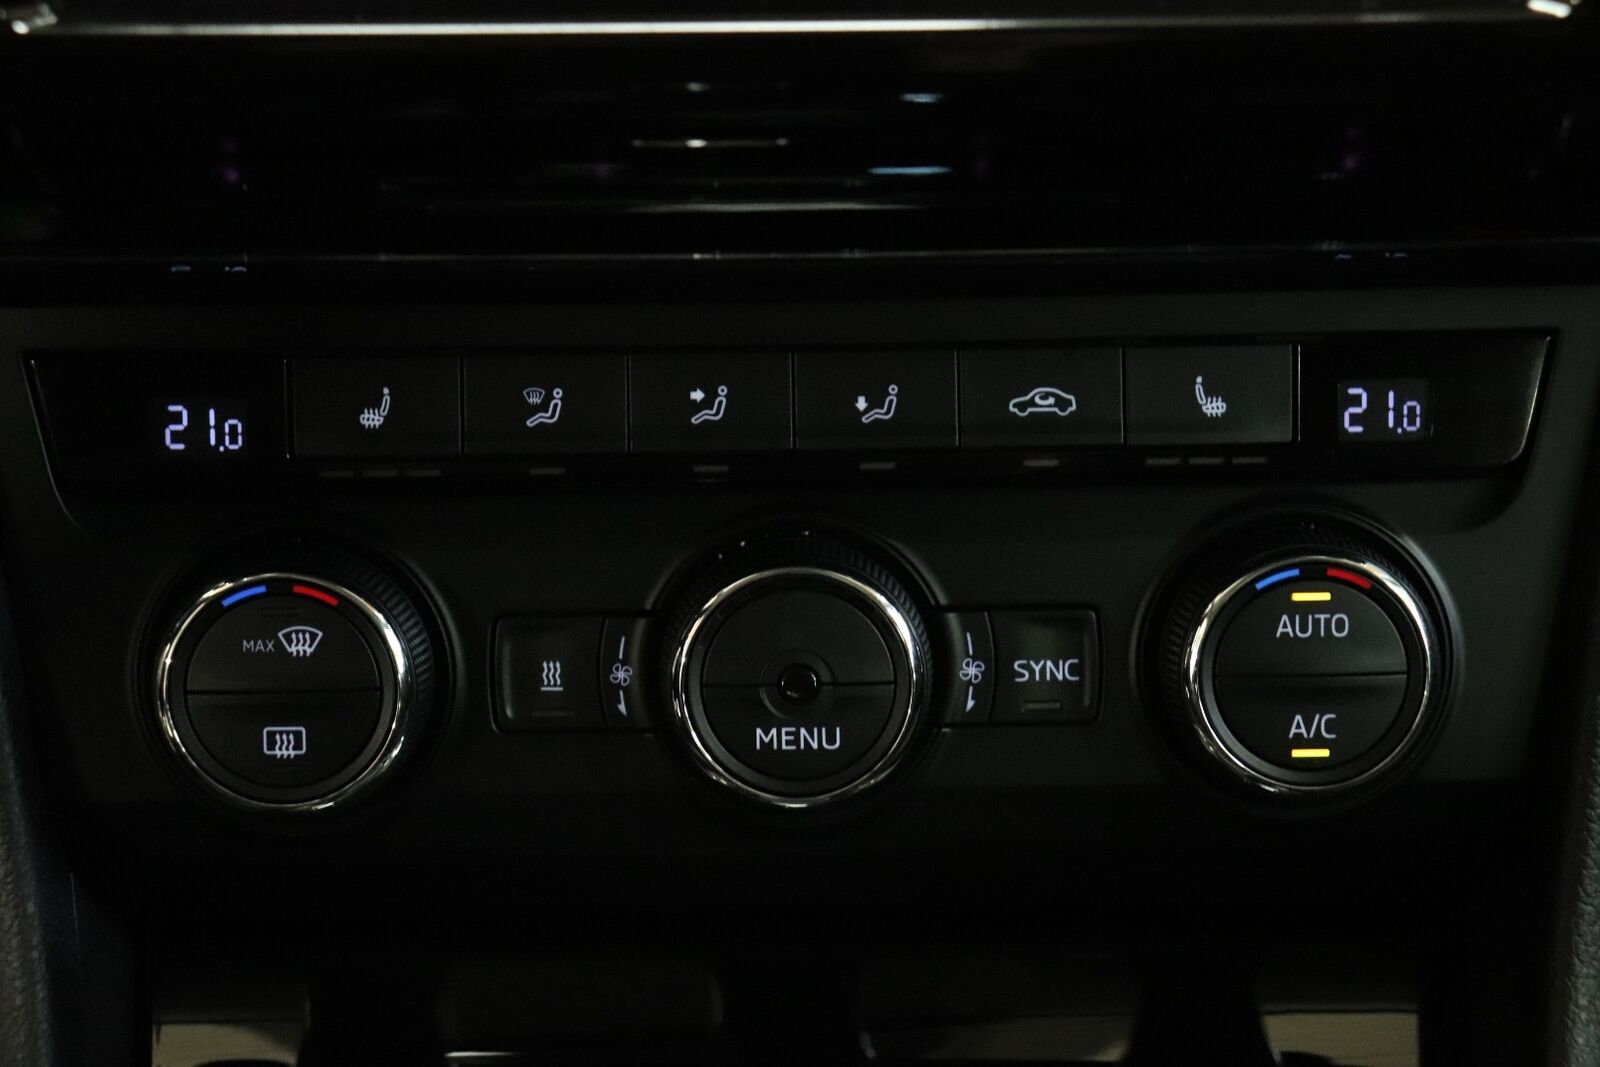 Skoda Superb 2,0 TDi 190 Style Combi DSG